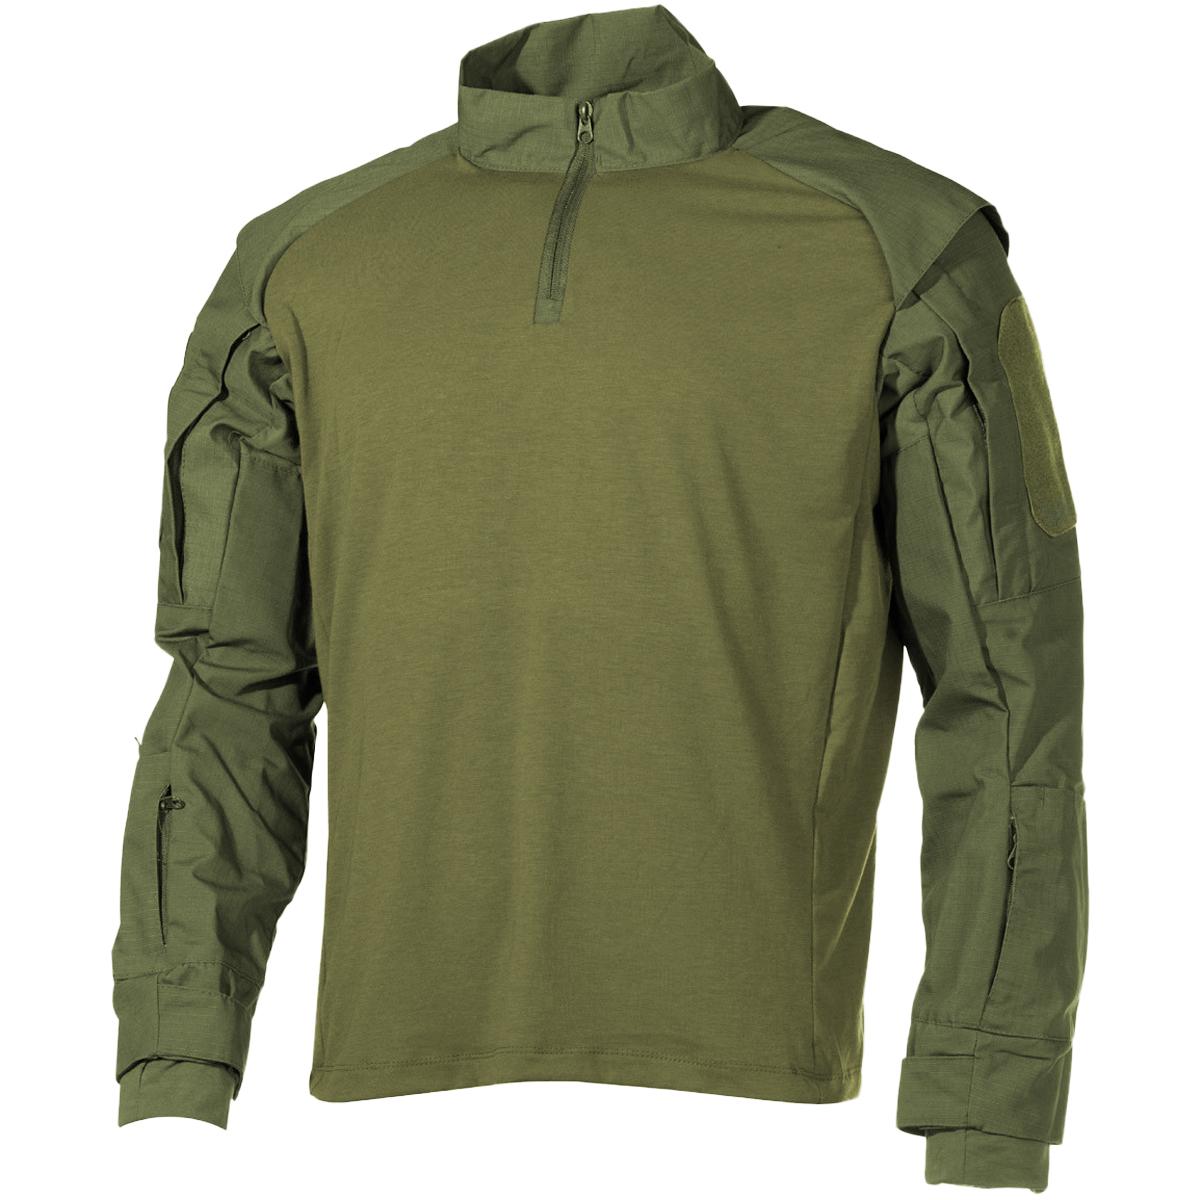 MFH-US-Chemise-Tactique-Hommes-Combat-Militaire-Chasse-UBACS-Top-Airsoft-OD-Vert